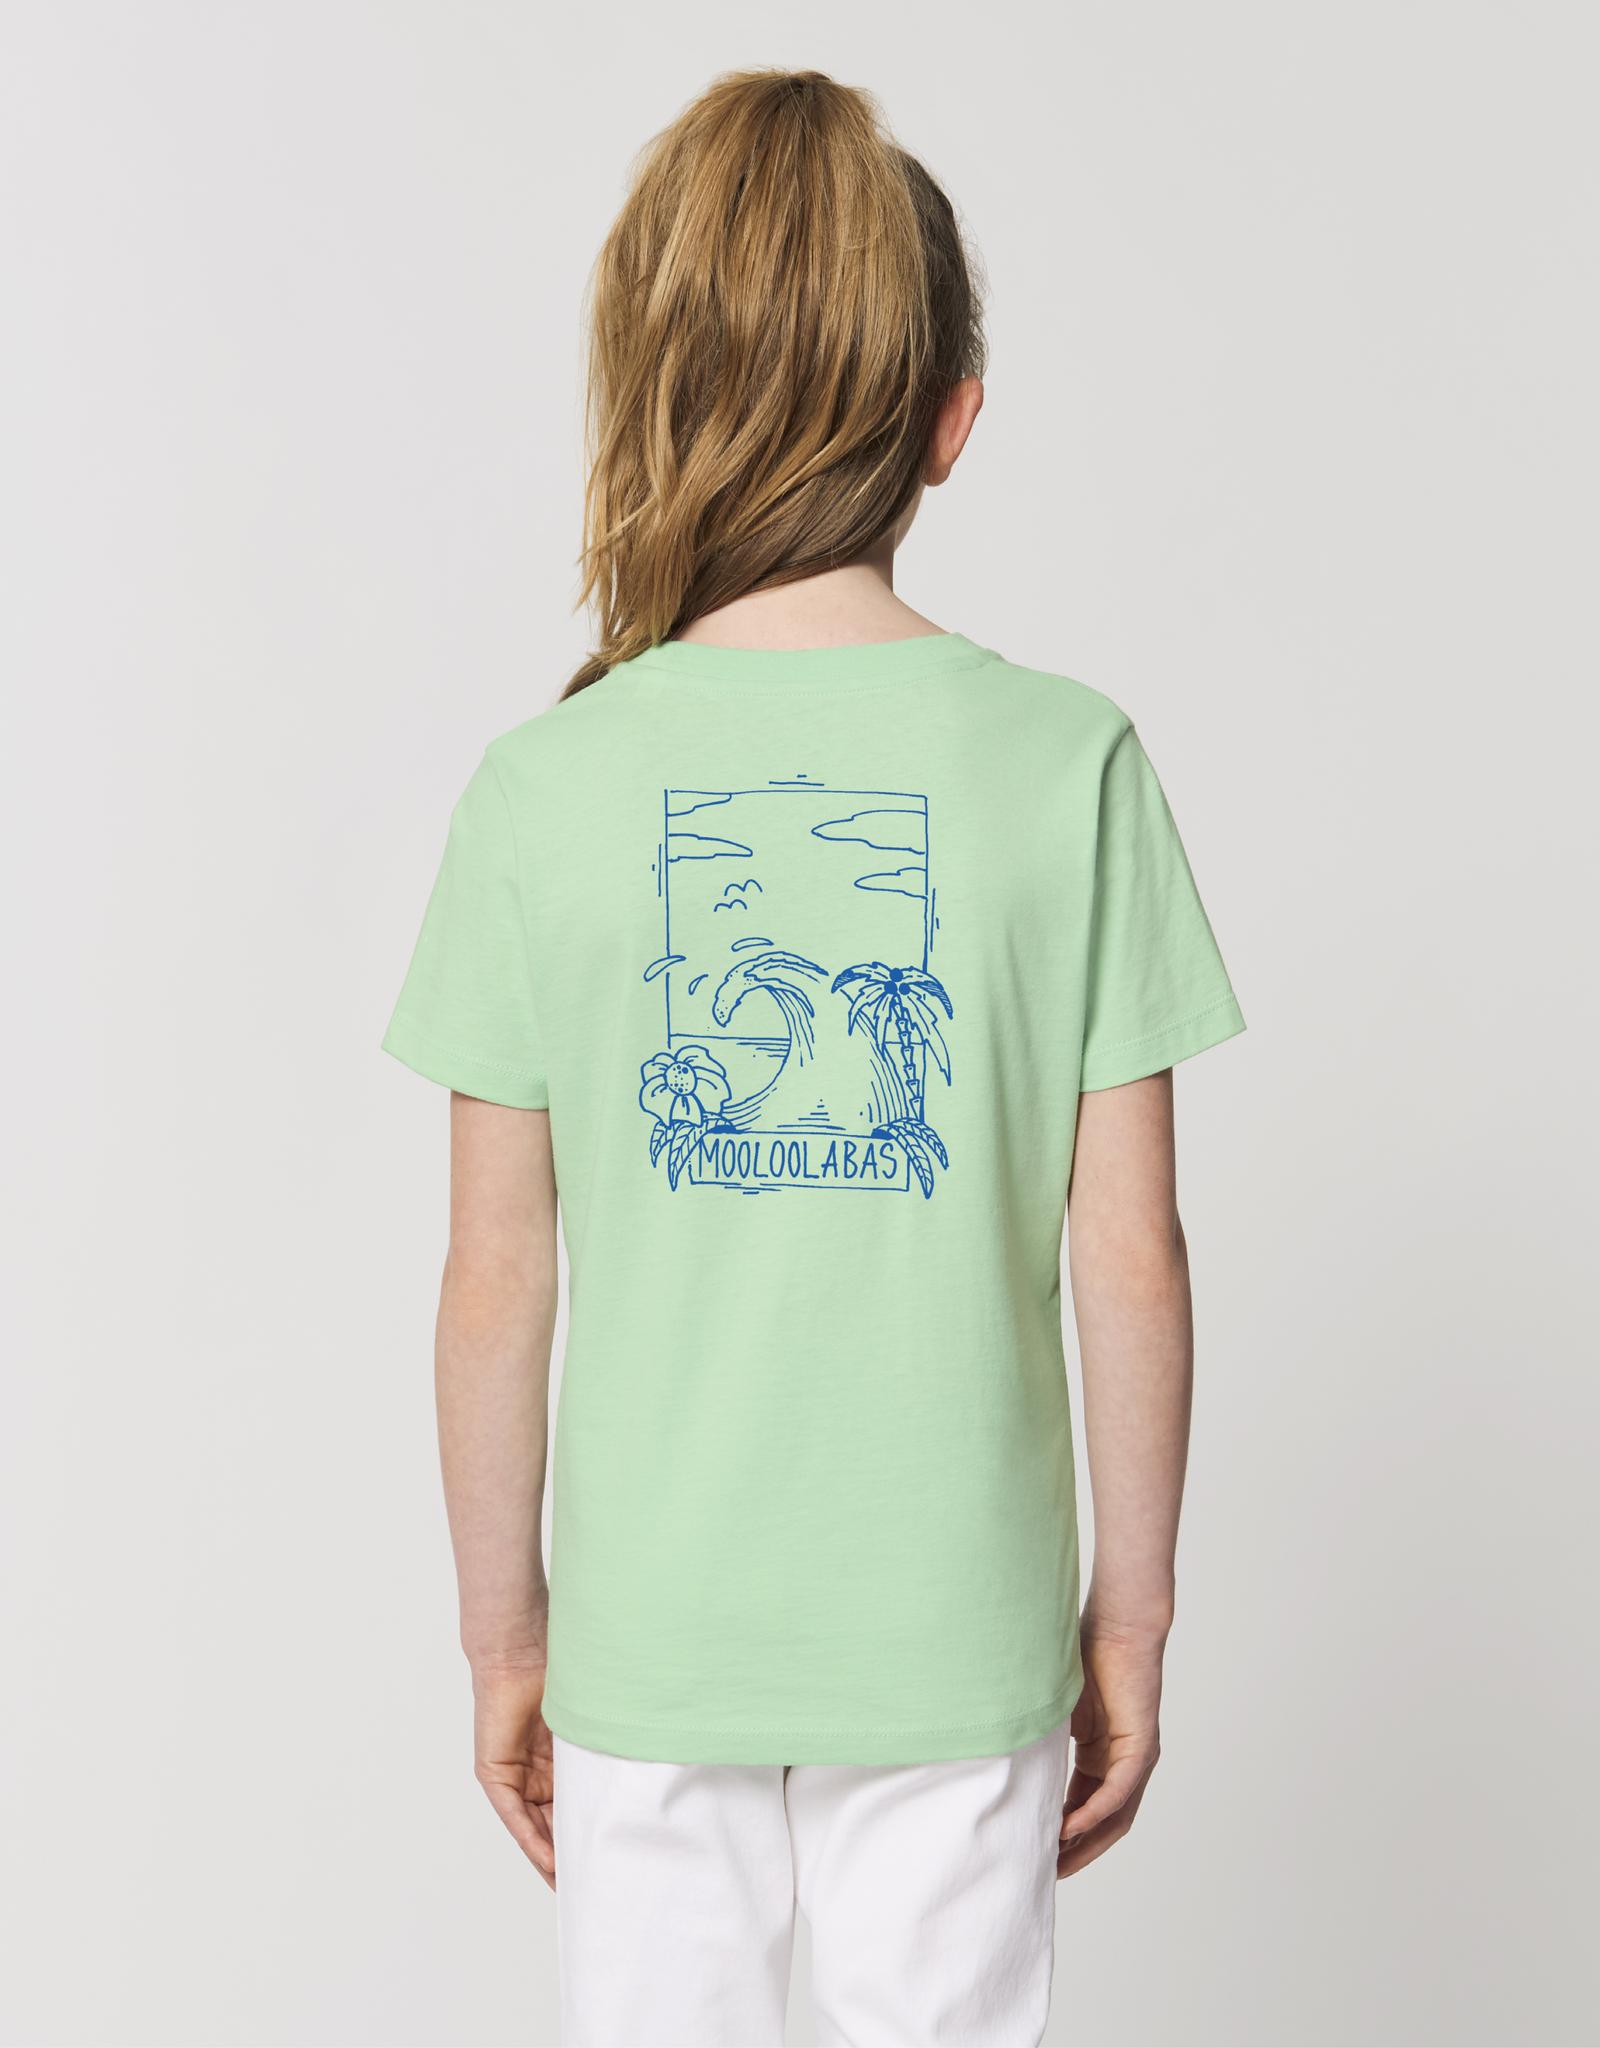 MOOLOOLABAS Kids T-Shirt